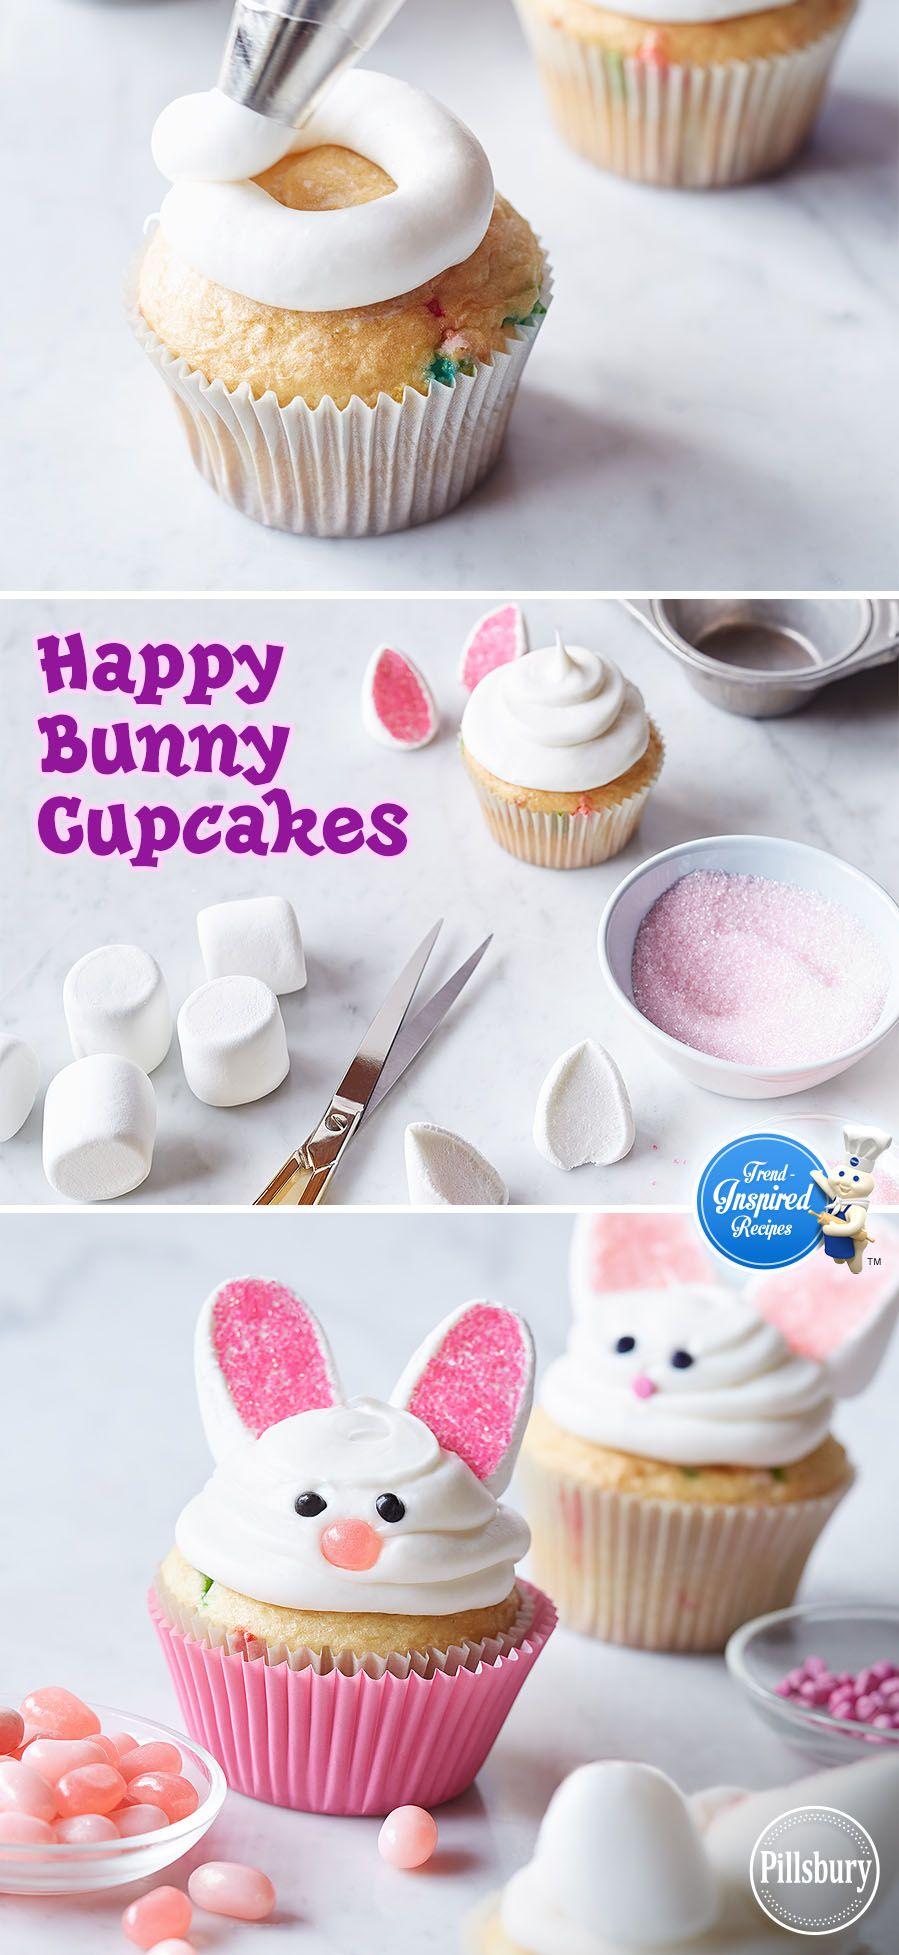 Happy bunny cupcakes recipe bunny cupcakes white cupcakes and